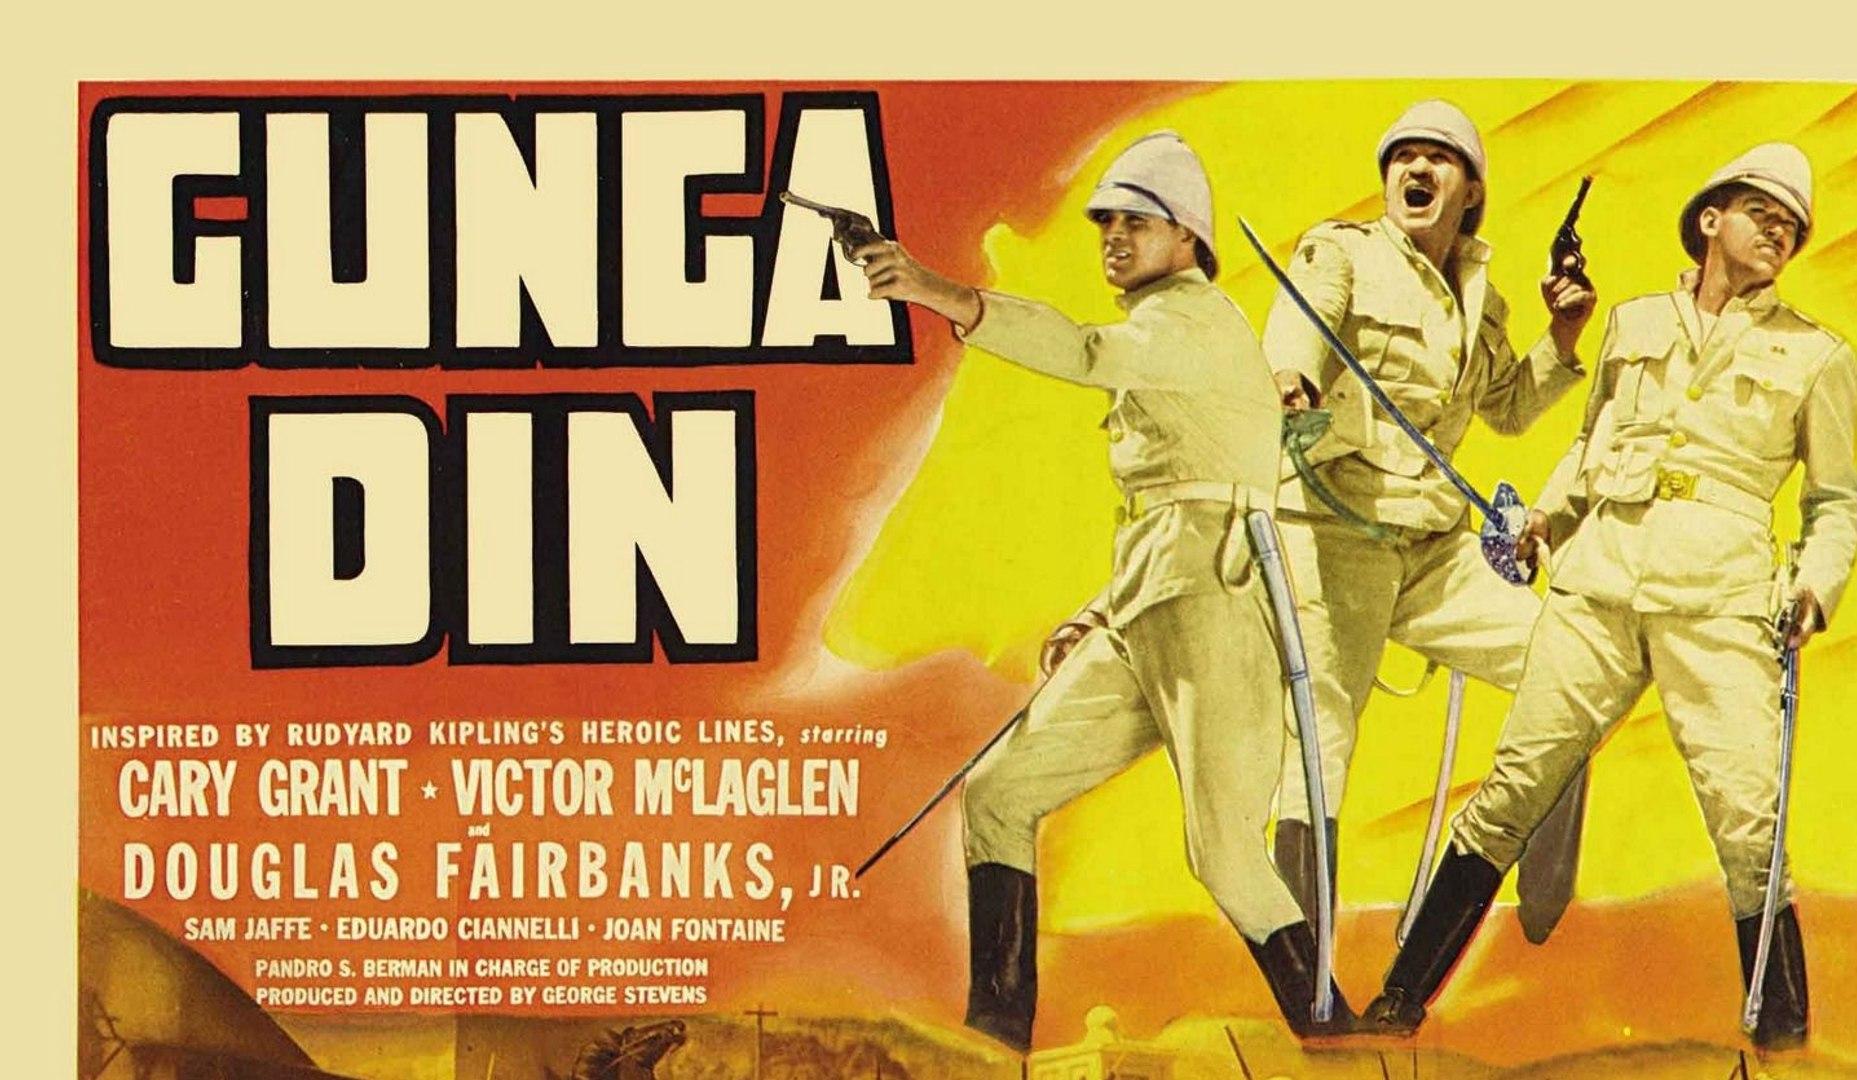 Gunga Din Movie 1939 Video Dailymotion 'if you don't fill up my helmet, gunga din!' 'e would dot an' carry one. gunga din movie 1939